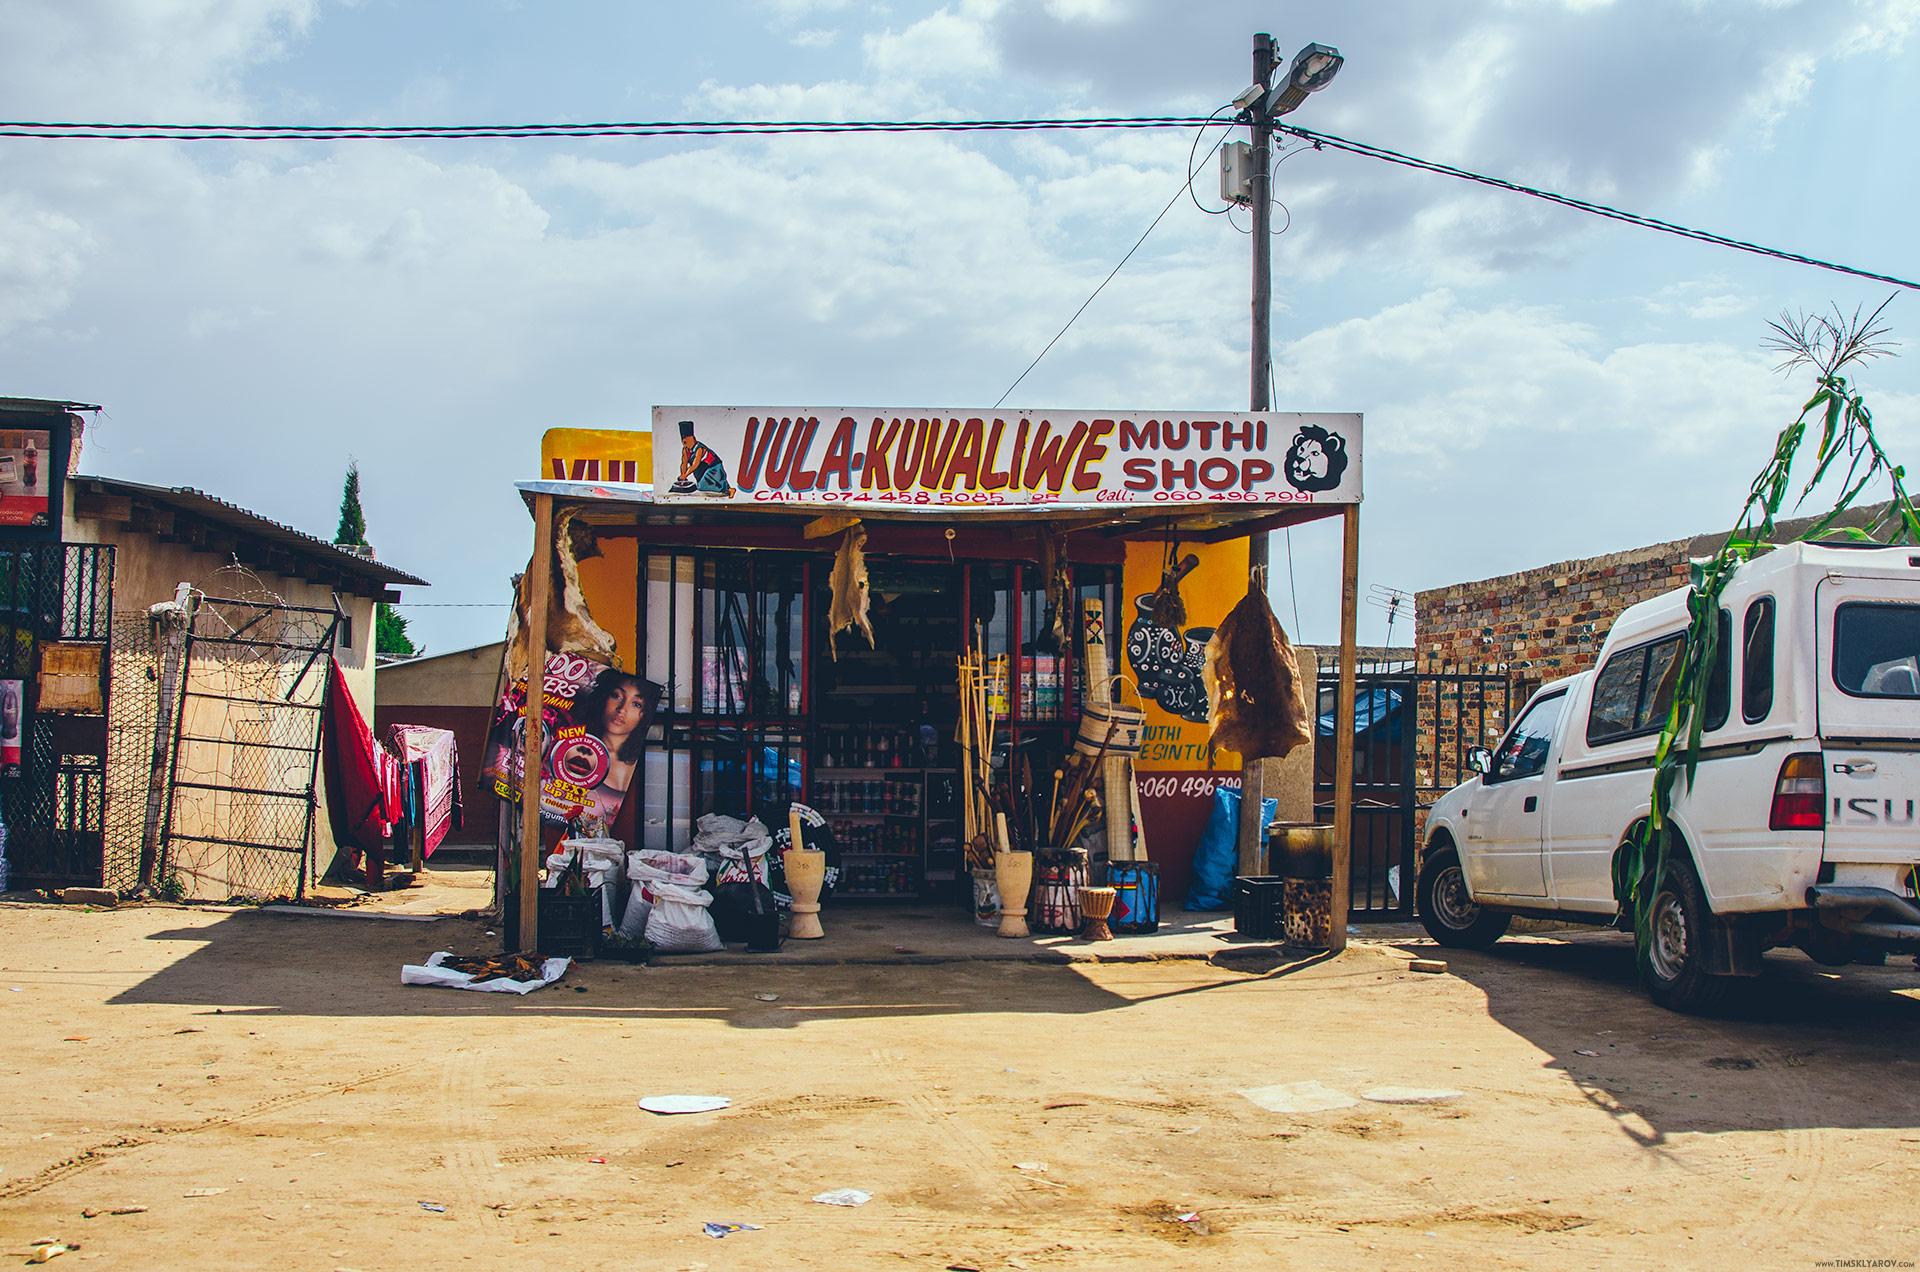 johannesburg-townships-soweto_004